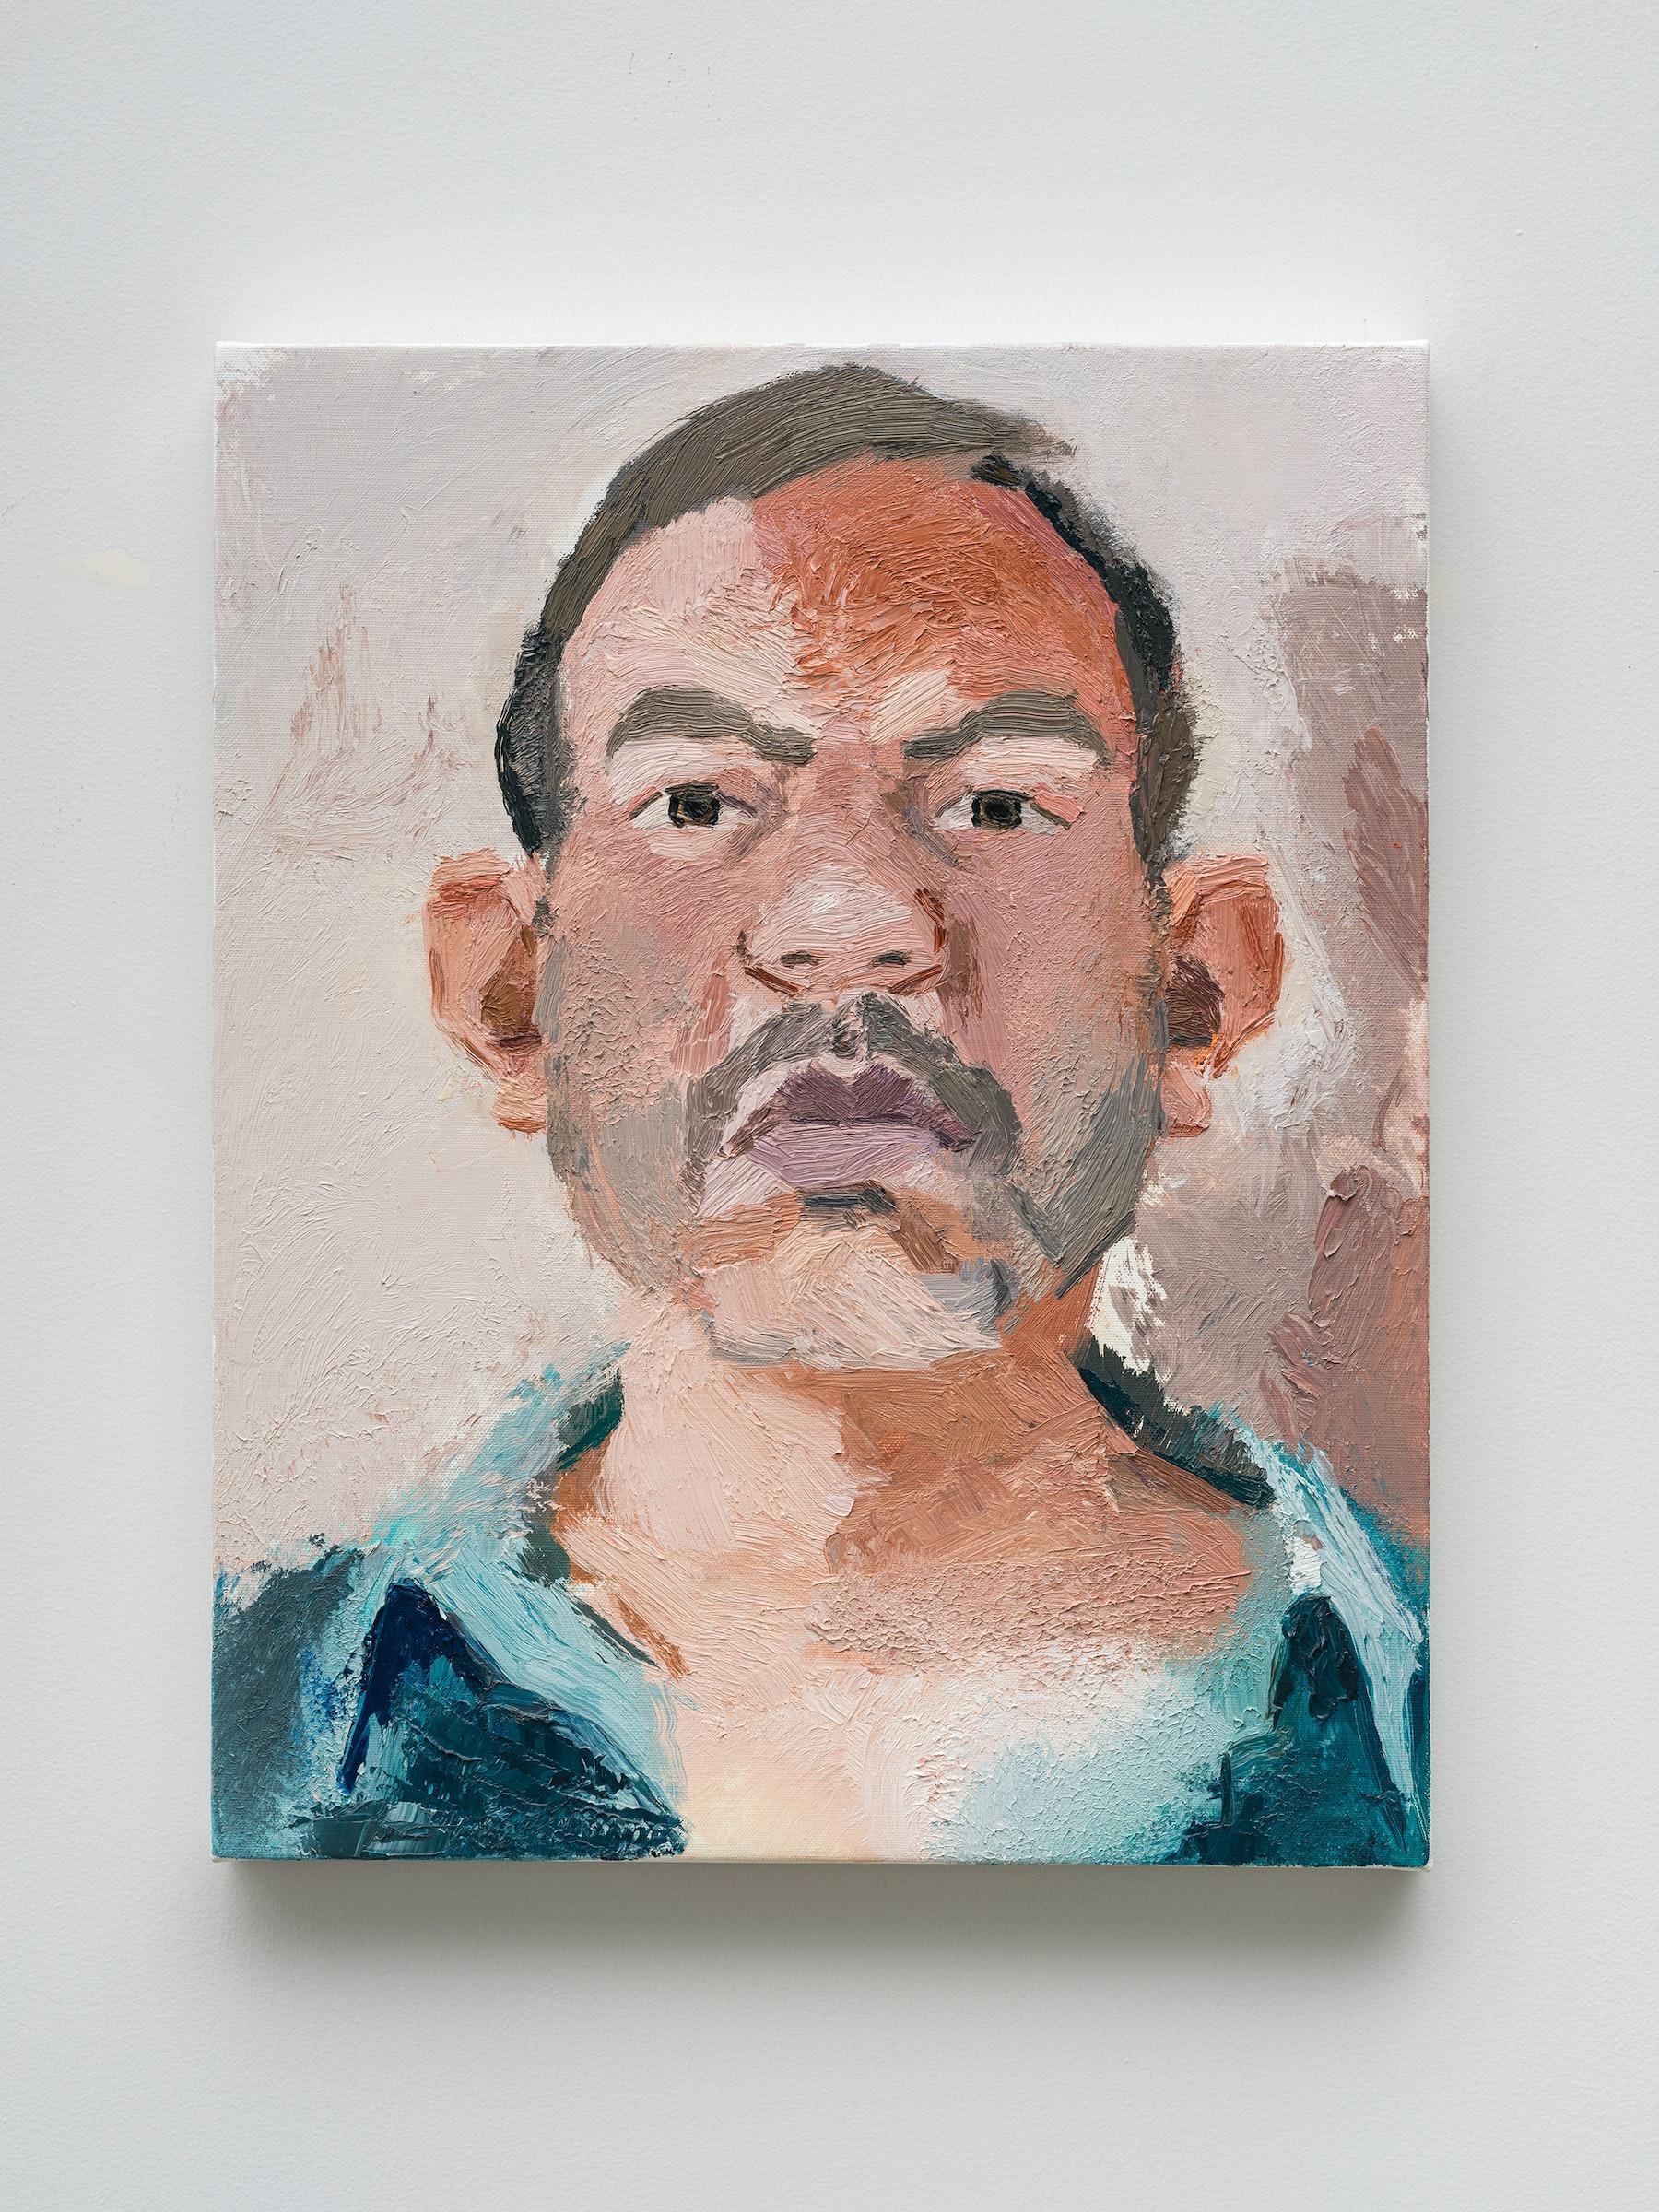 "John Sonsini ""Gabriel,"" 2021 Oil on canvas 20"" x 16"" [HxW] (50.8 x 40.64 cm) Inventory #SON129 Courtesy of the artist and Vielmetter Los Angeles Photo credit: Jeff Mclane"